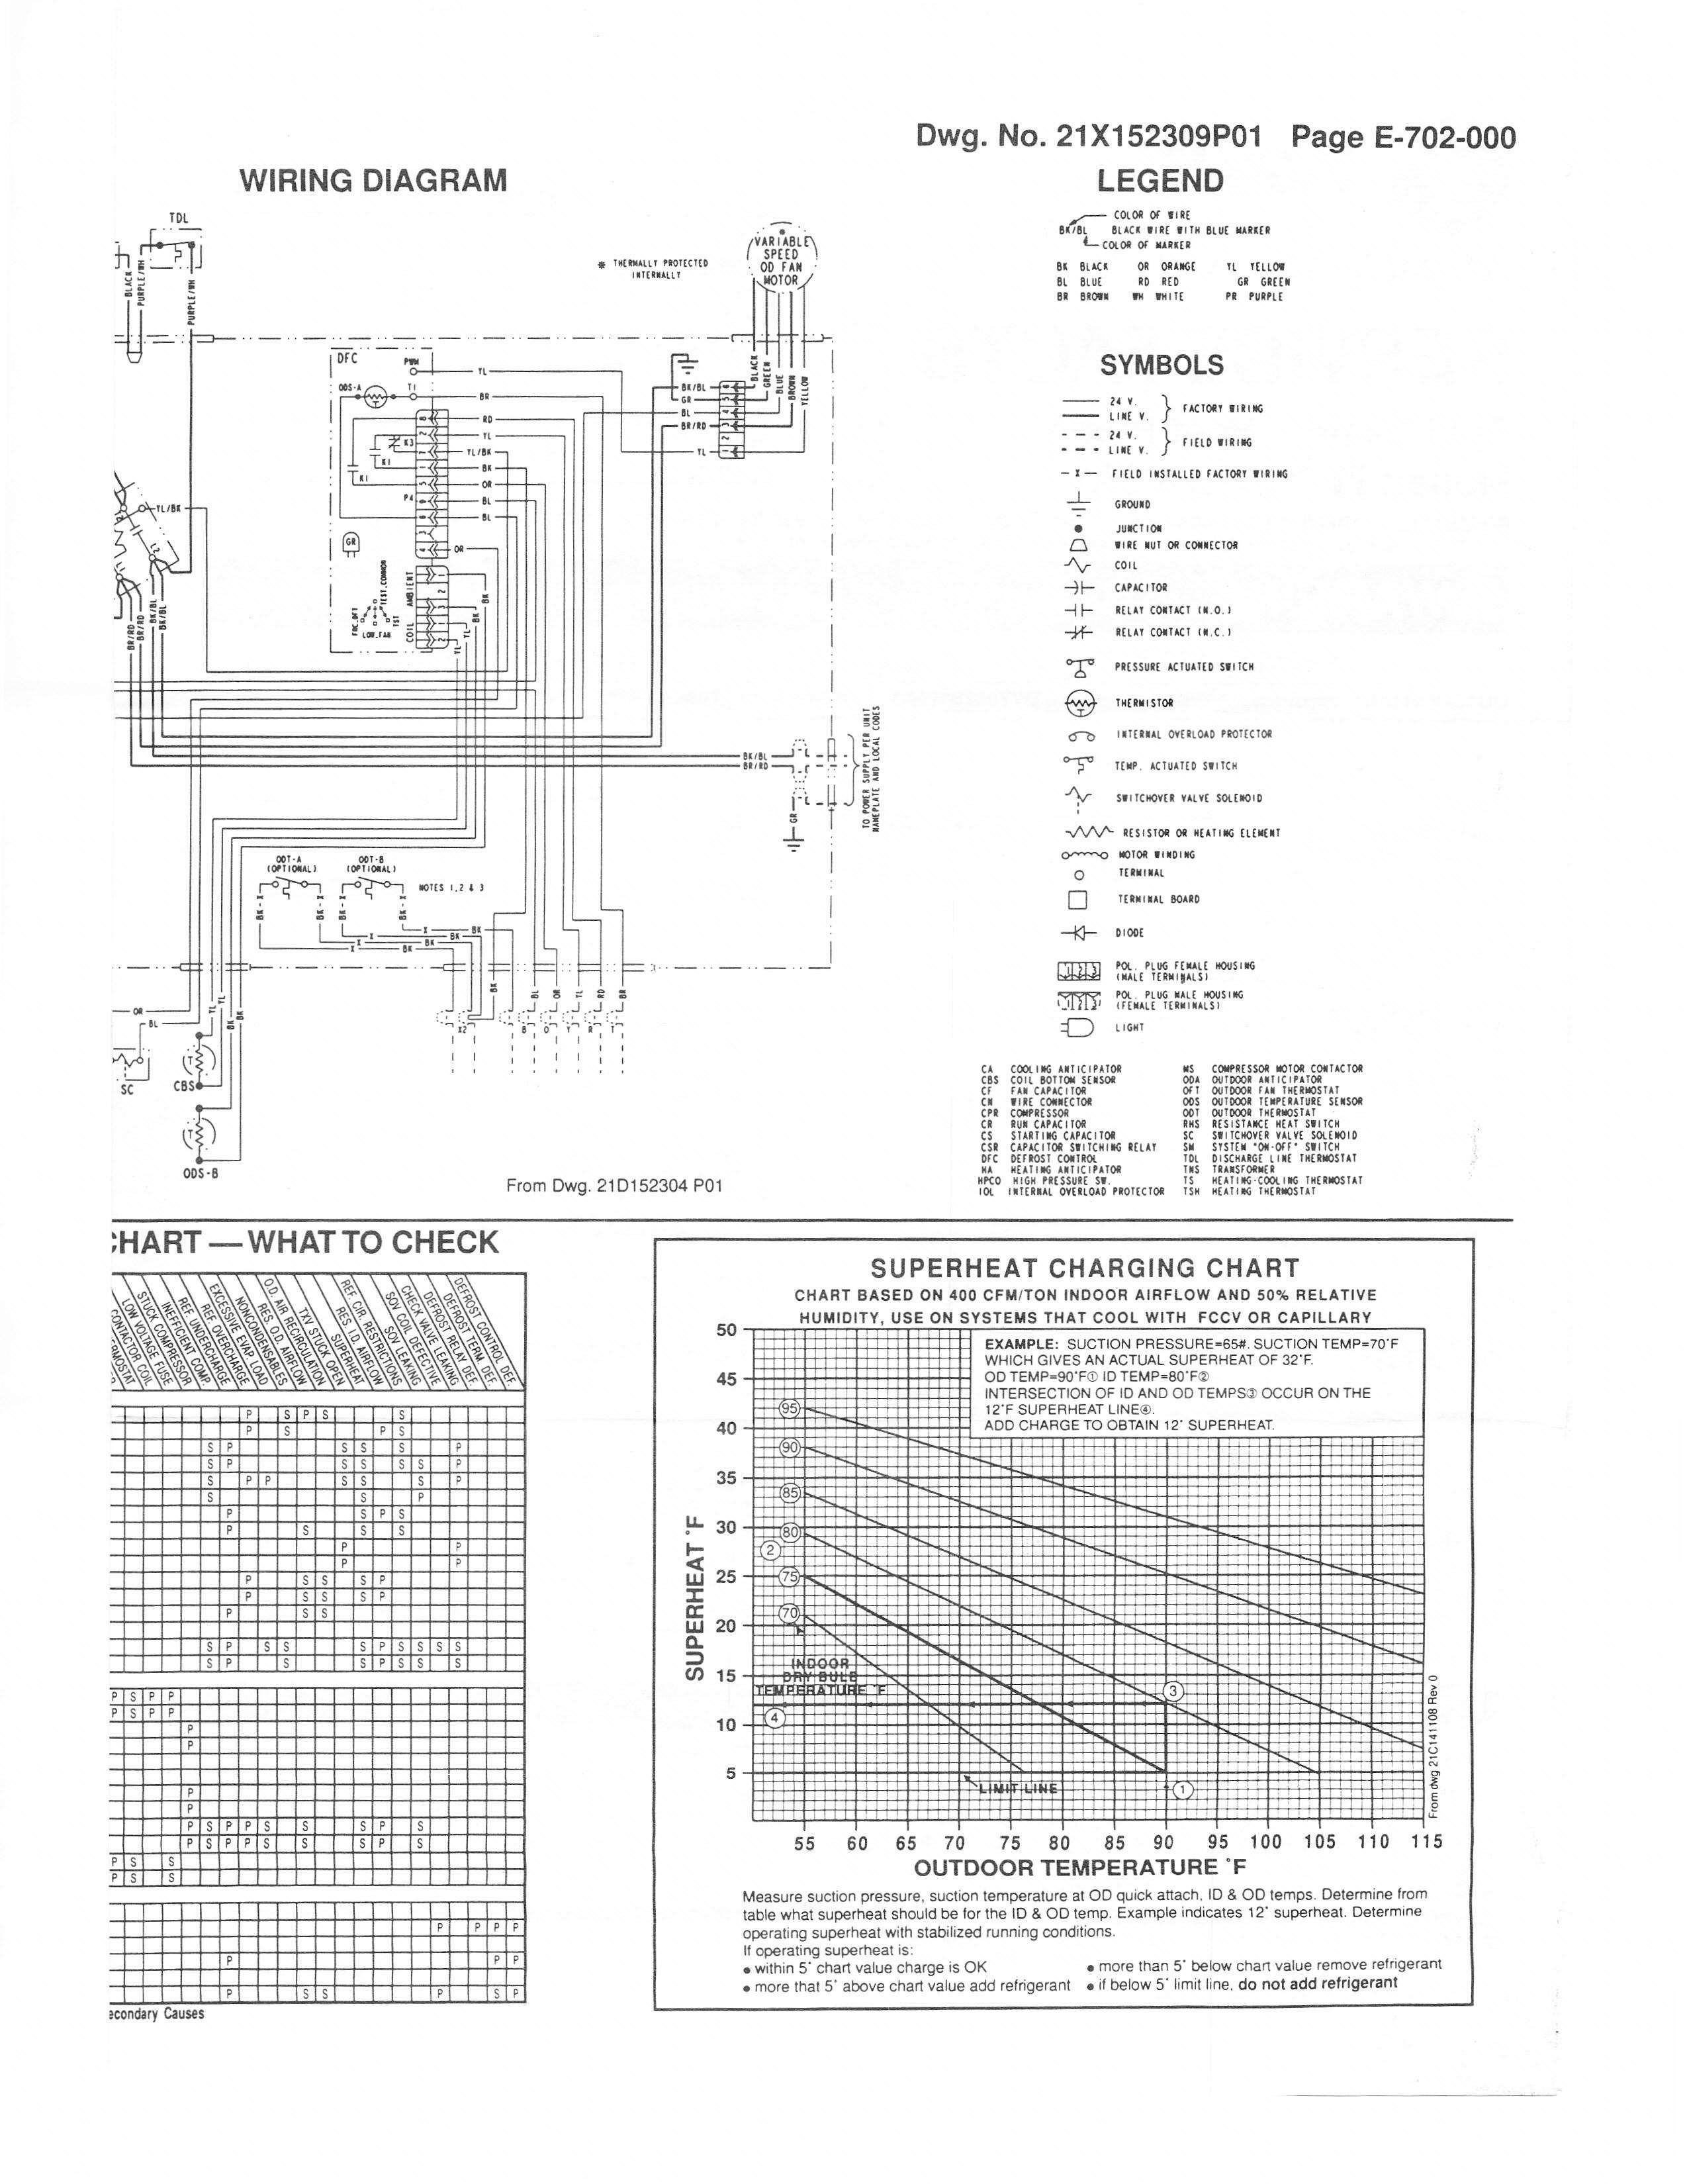 Wiring Model Trane Diagram Bathtrm330a Diagrams Evinrude Johnson Omc New Instrument Tach Harness 174732 Xe 1000 Xe1000